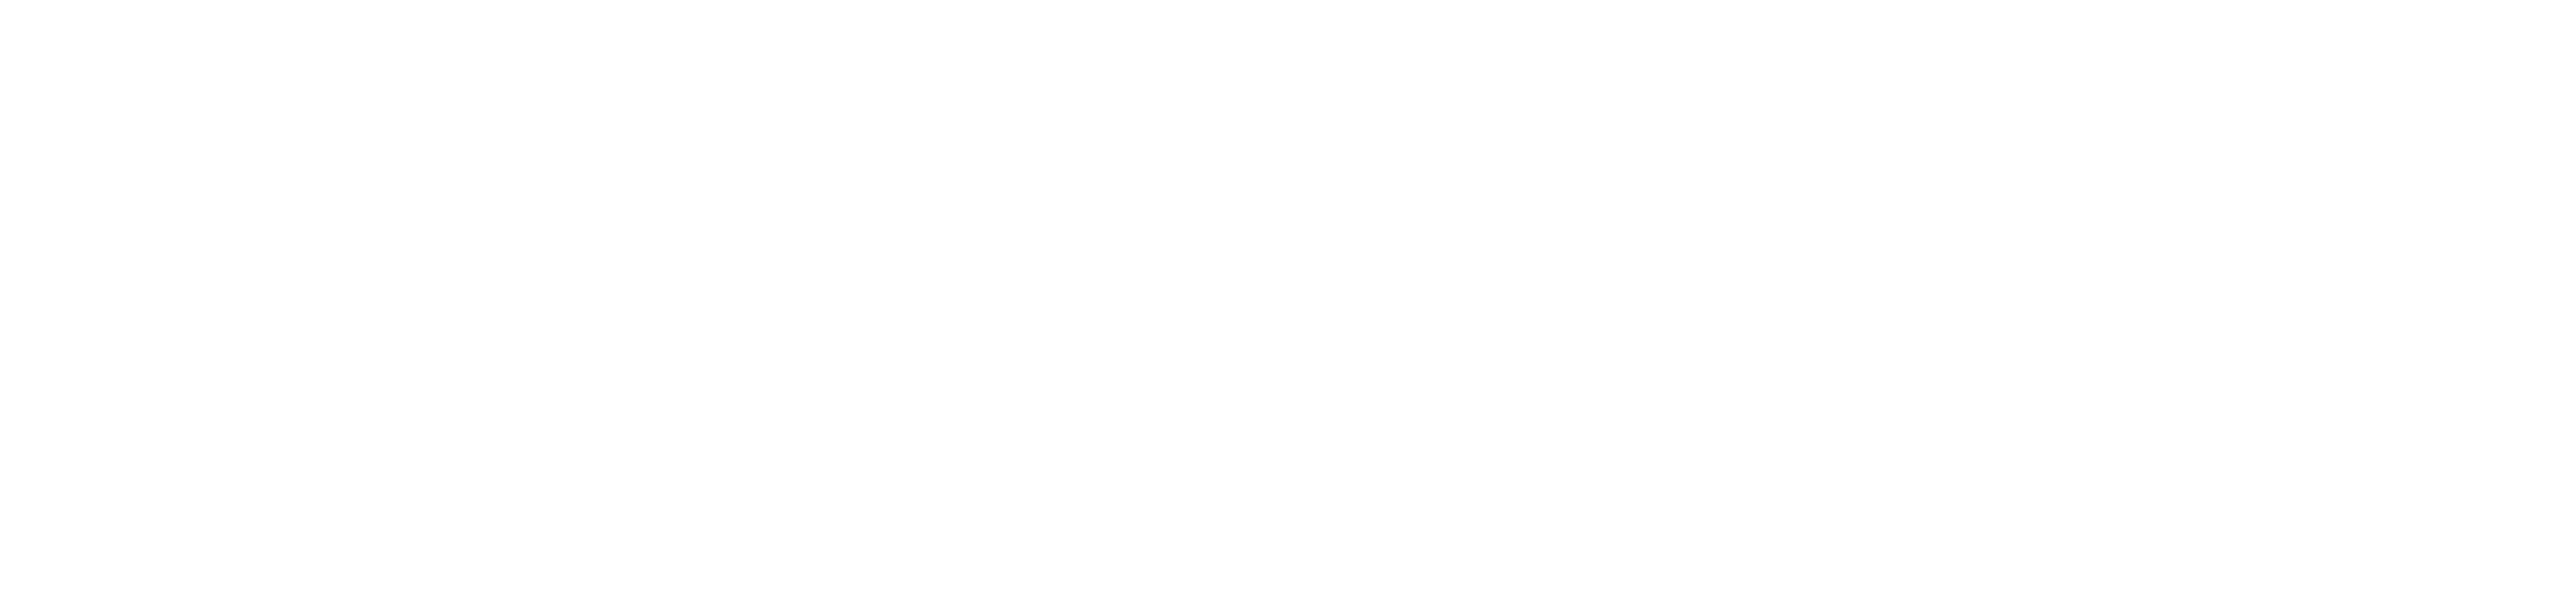 Lemontech software para abogados logo